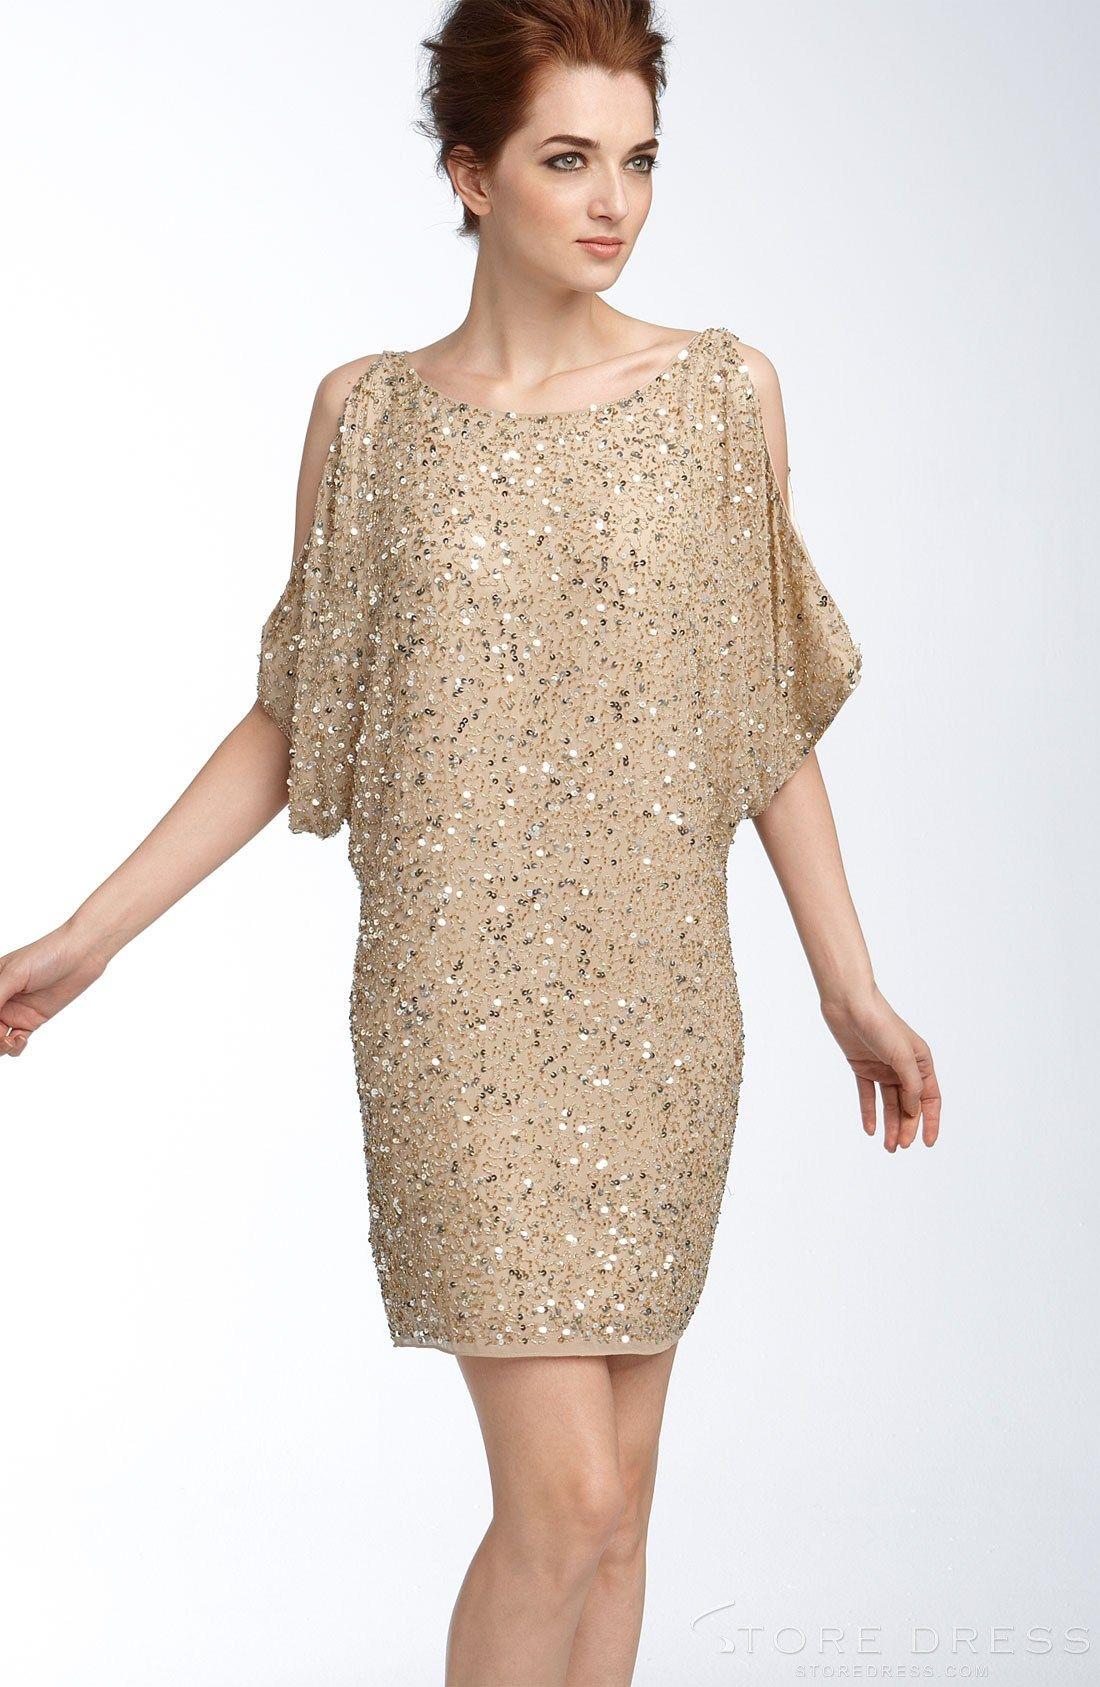 50th wedding anniversary dresses  Delicate Sheath  Column Scoop Kneelength Bridesmaid Dress at